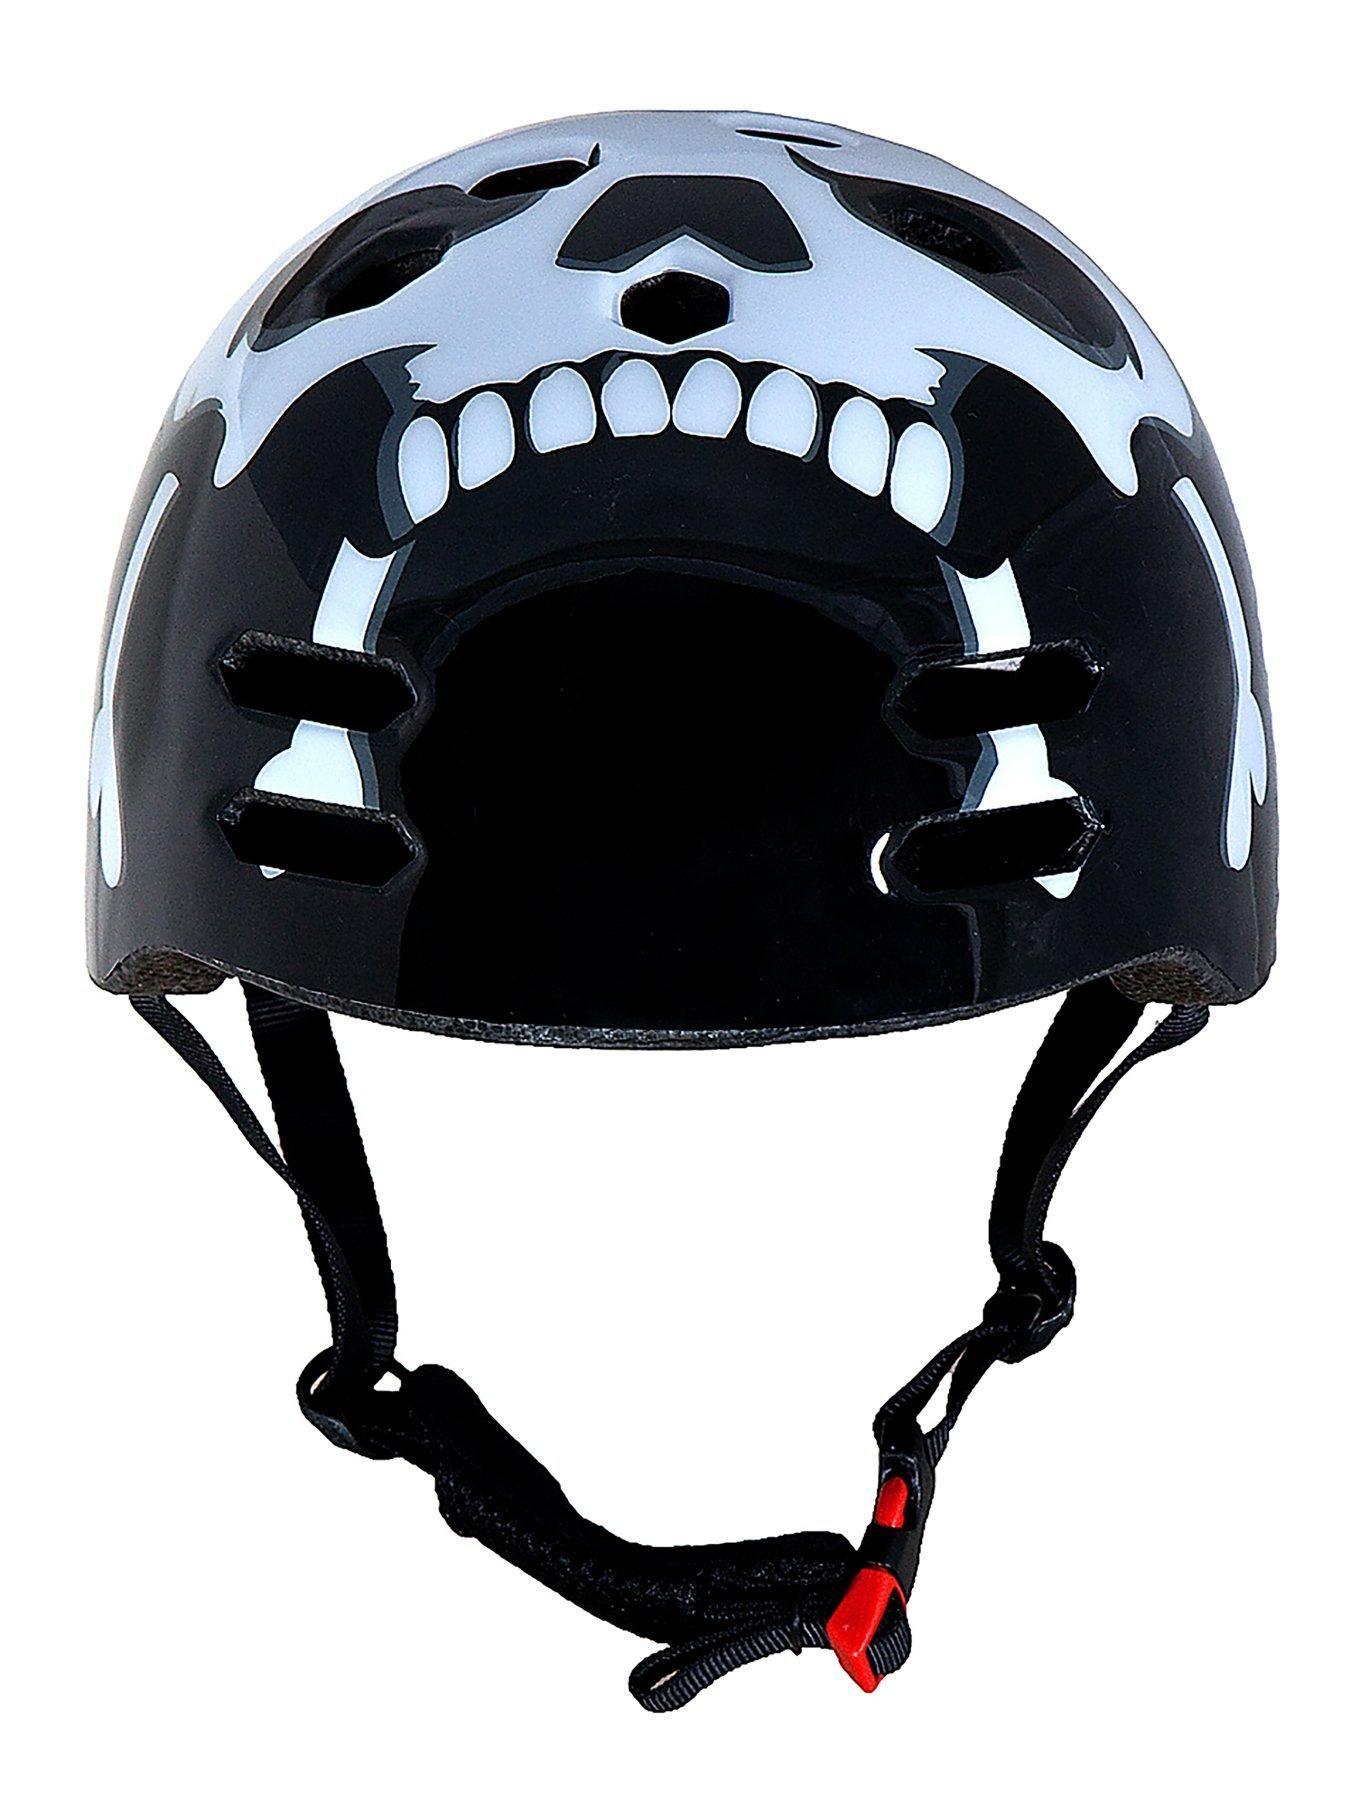 Sport Direct Skull and Cross Bones BMX Helmet 5558 cms